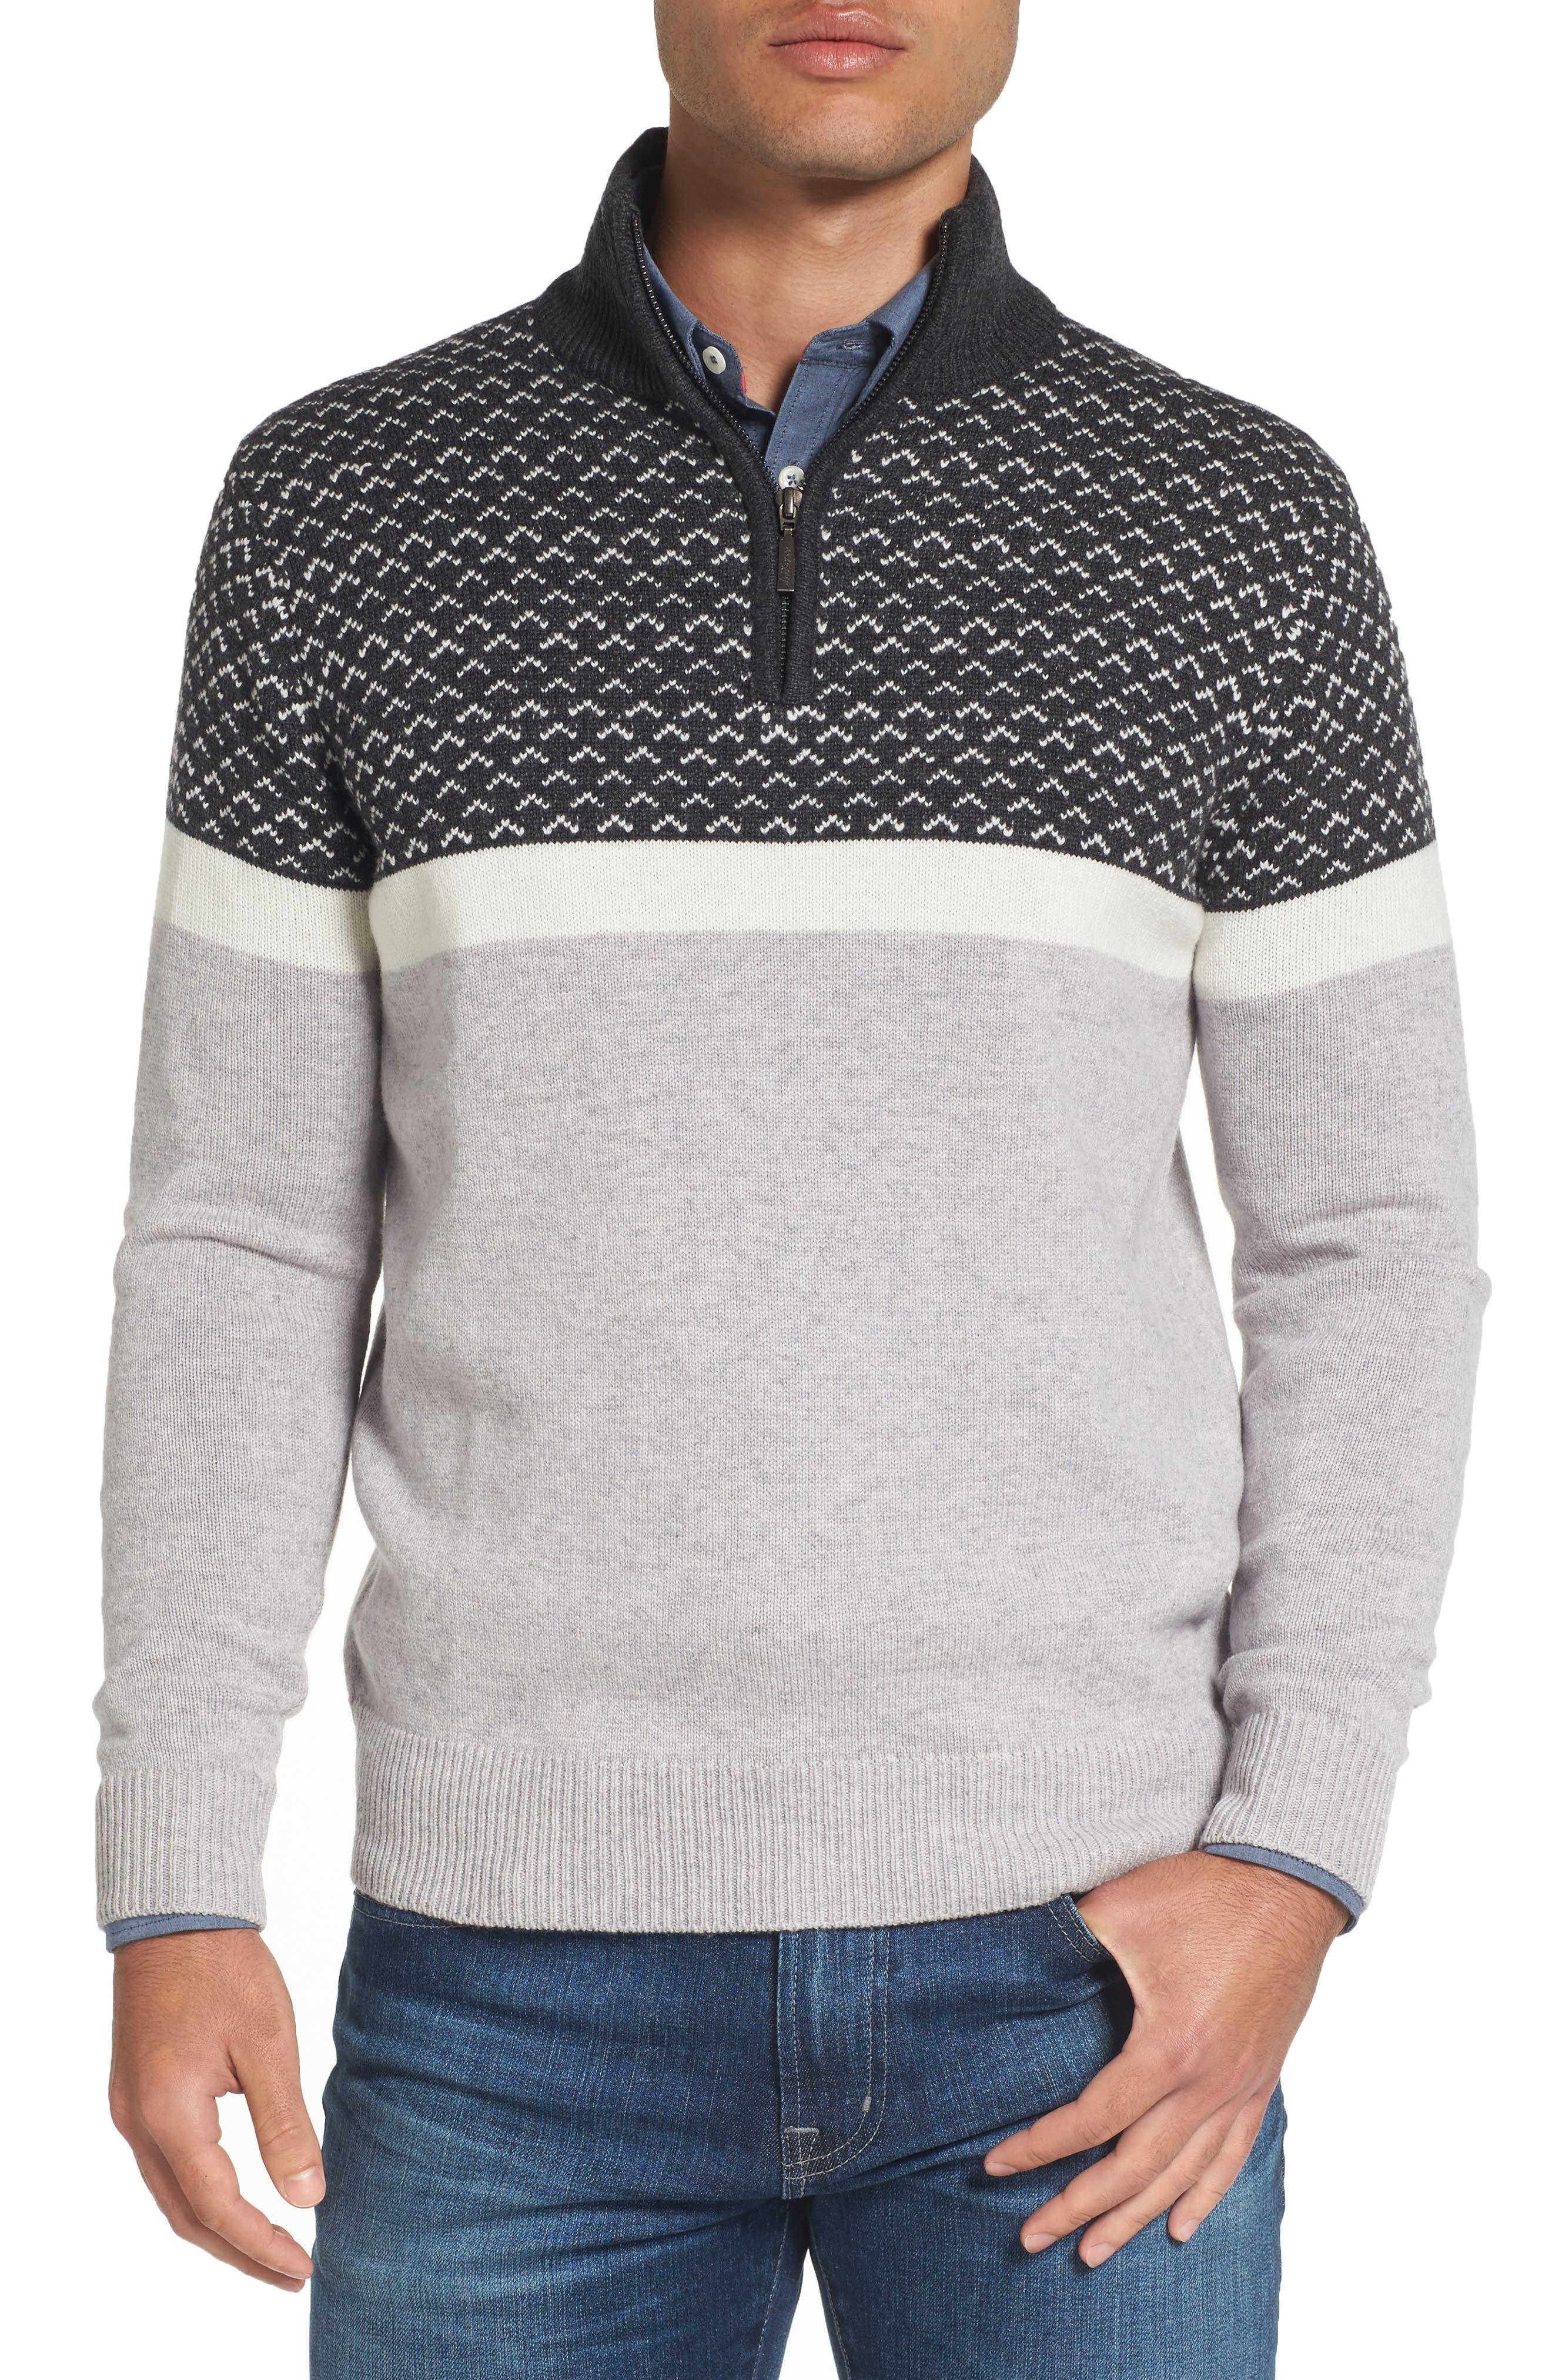 Jeremy Argyle Colorblock Wool Blend Quarter Zip Pullover